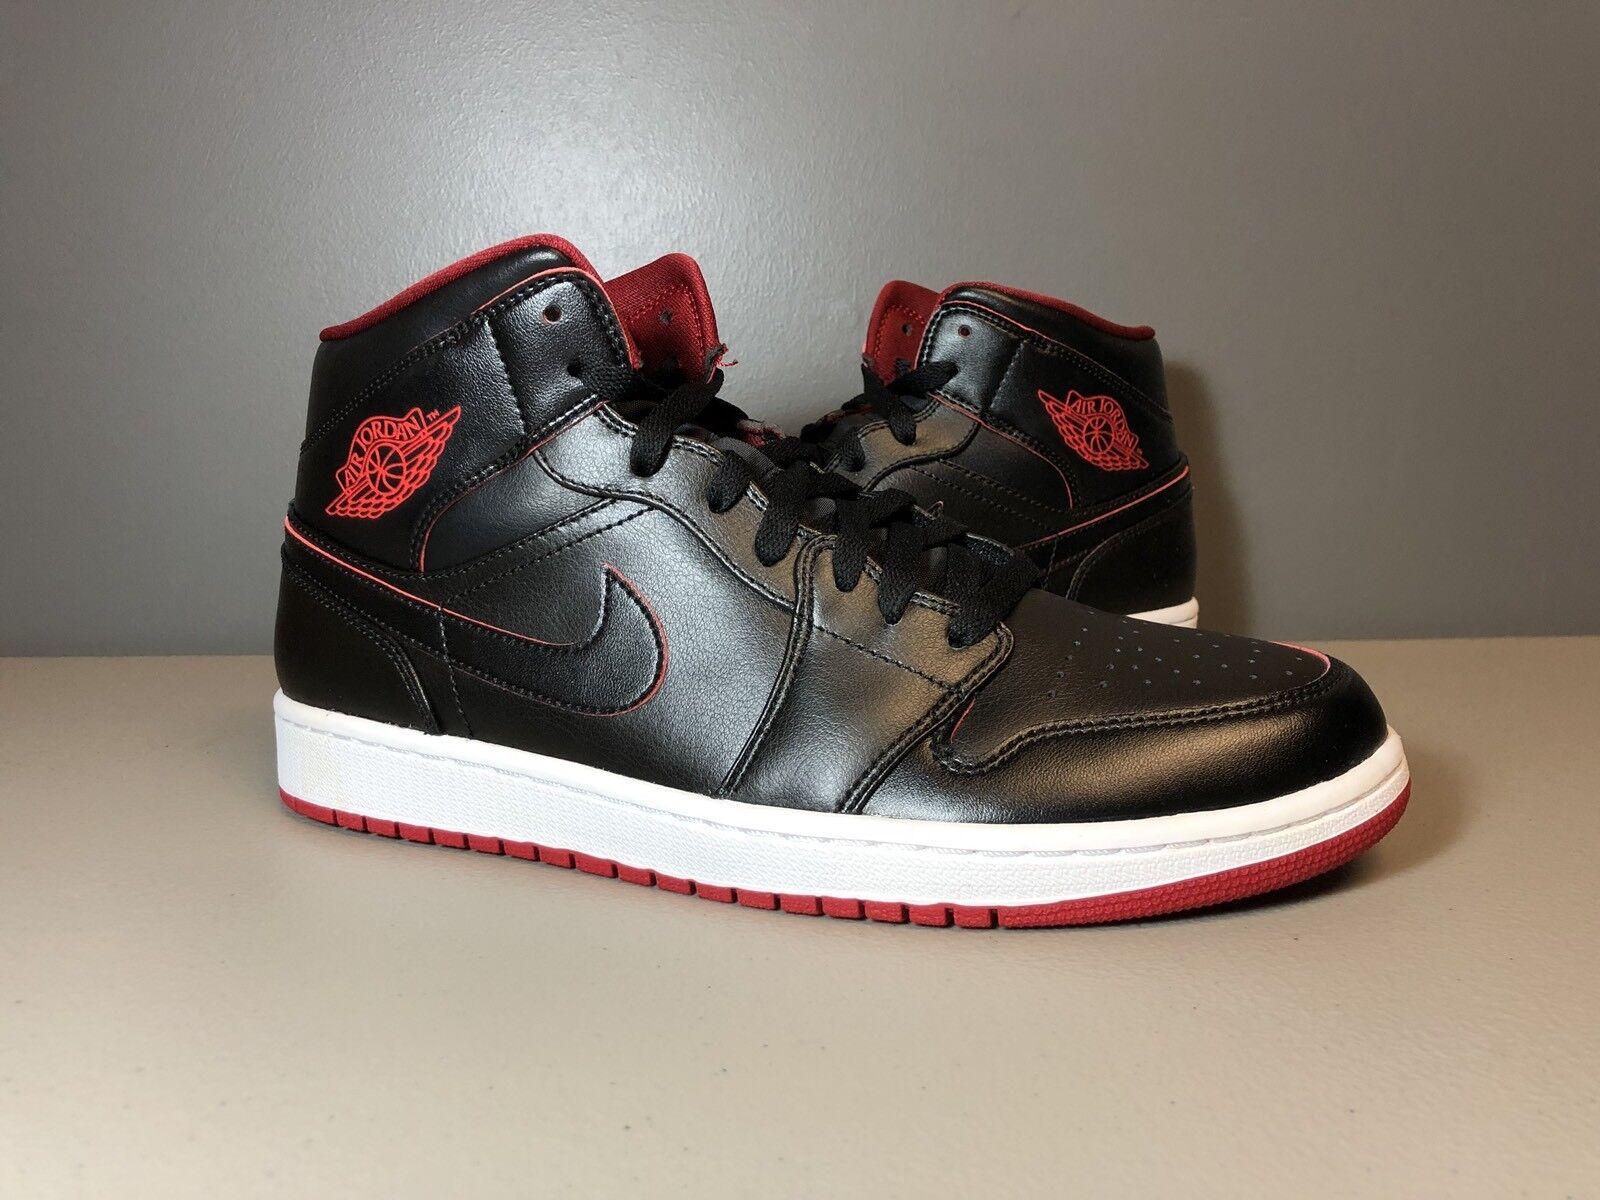 Nike Rojo Air Jordan 1 Mid Negro gimnasio Rojo Nike 554724 028 tamaño 10,5 444db0